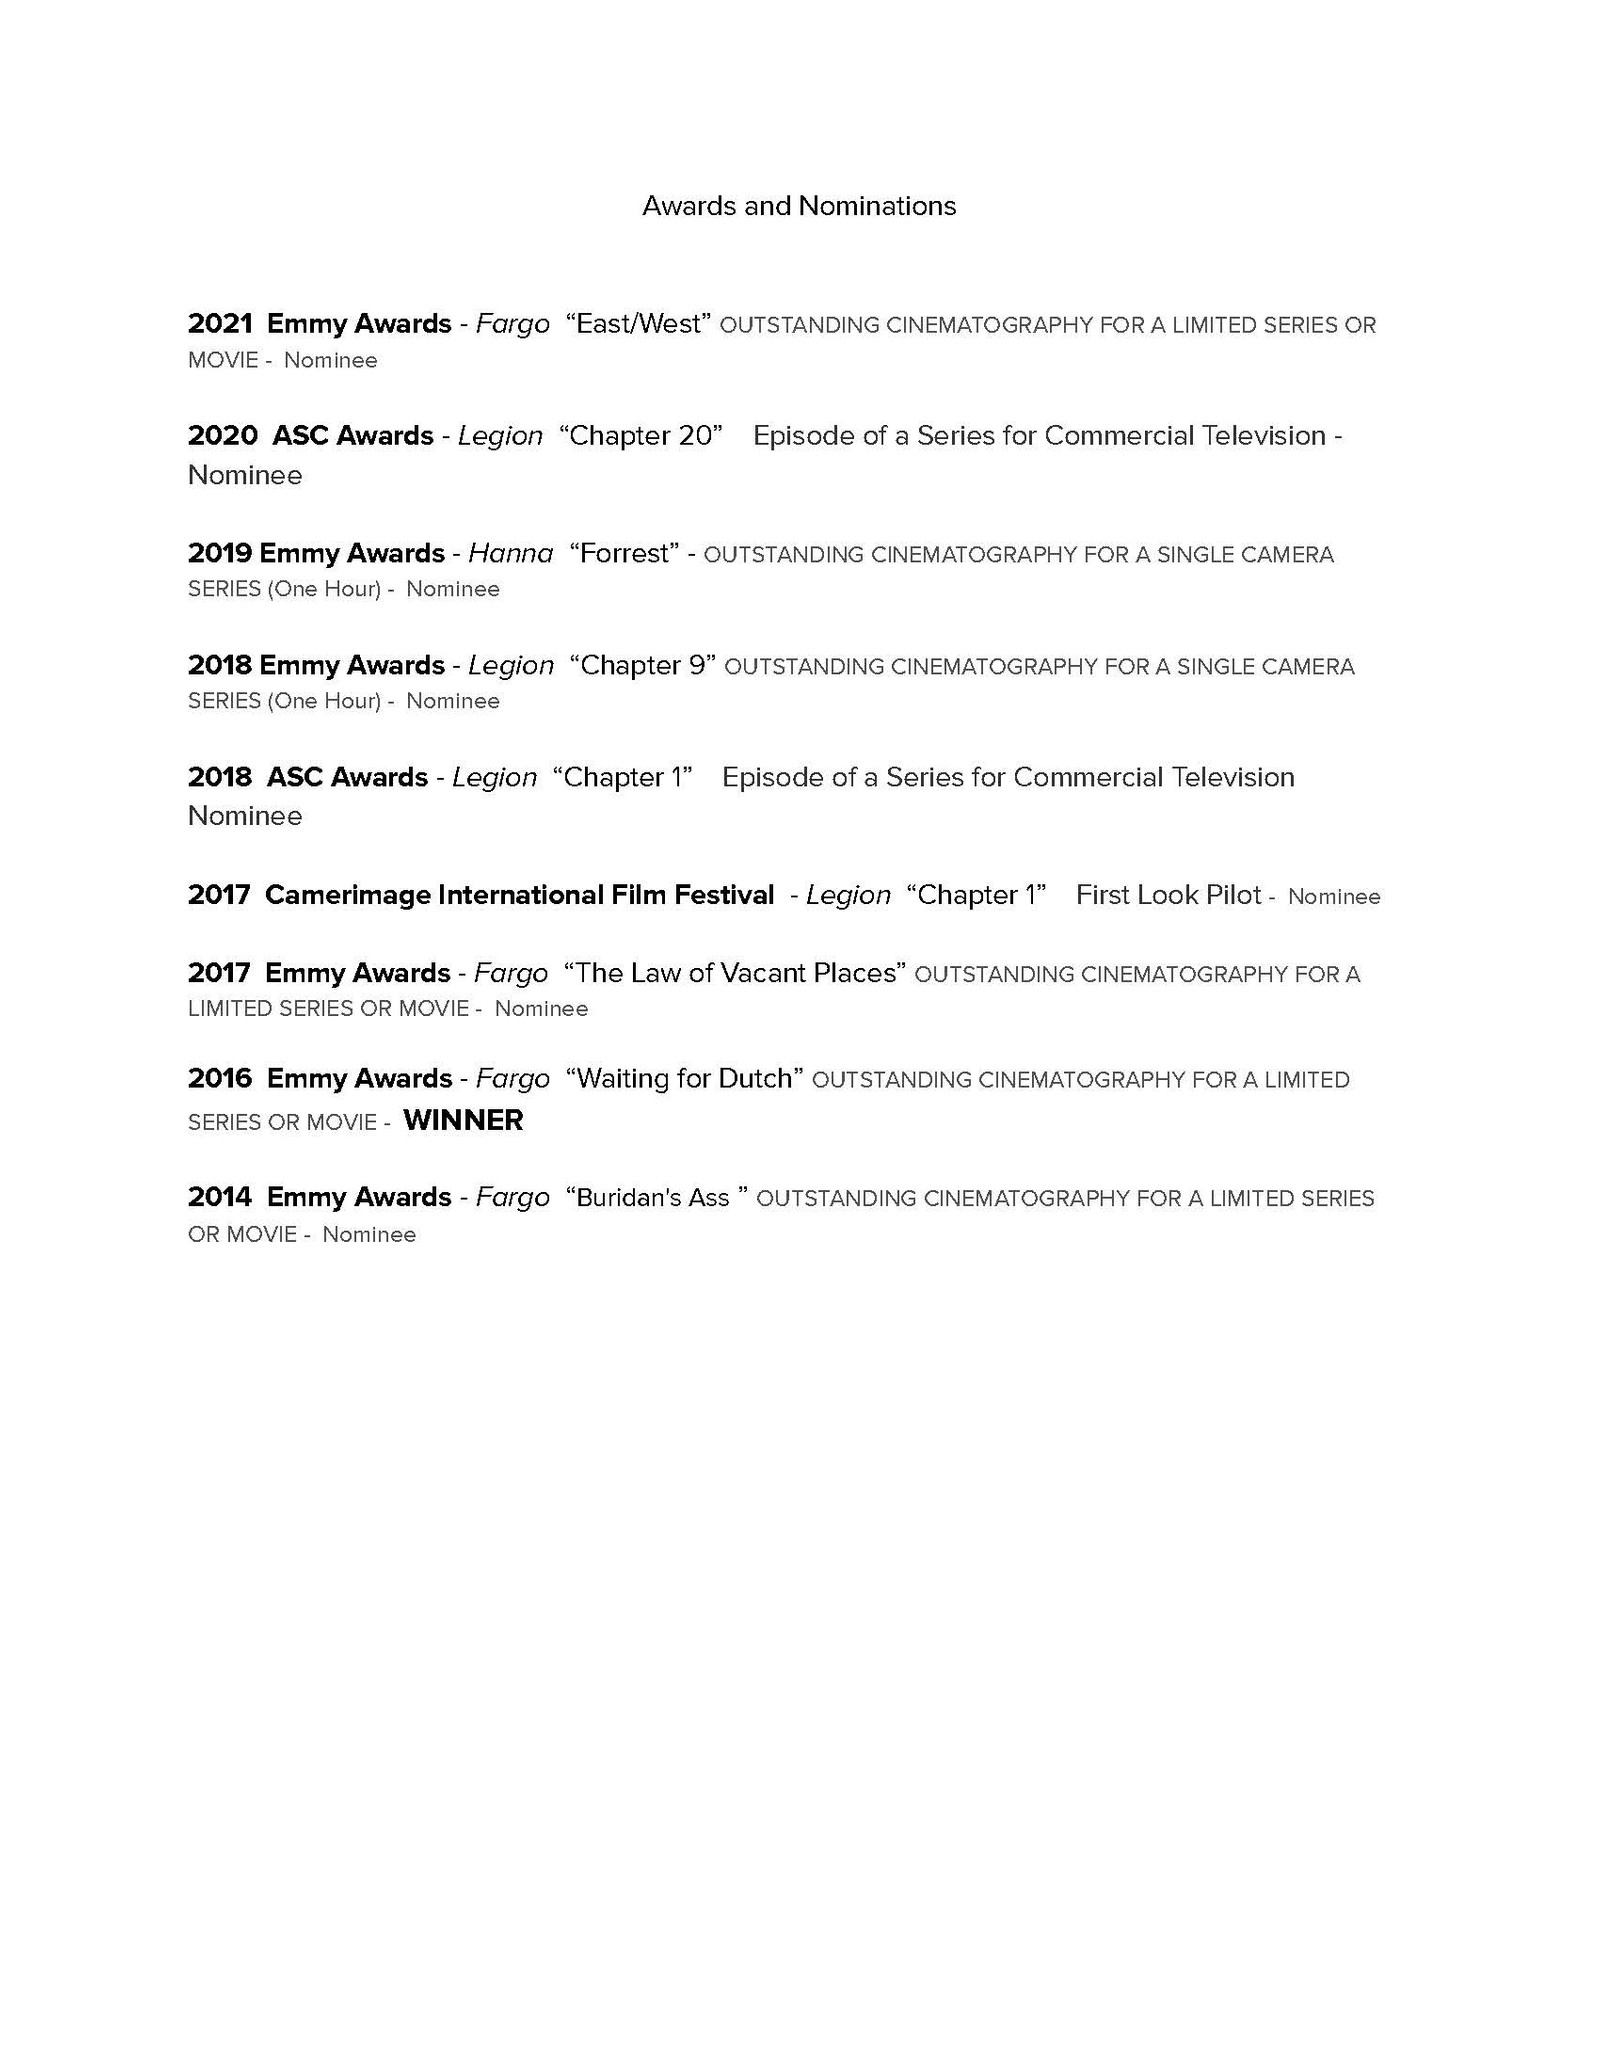 Awards and Nominations 2_2021.jpg